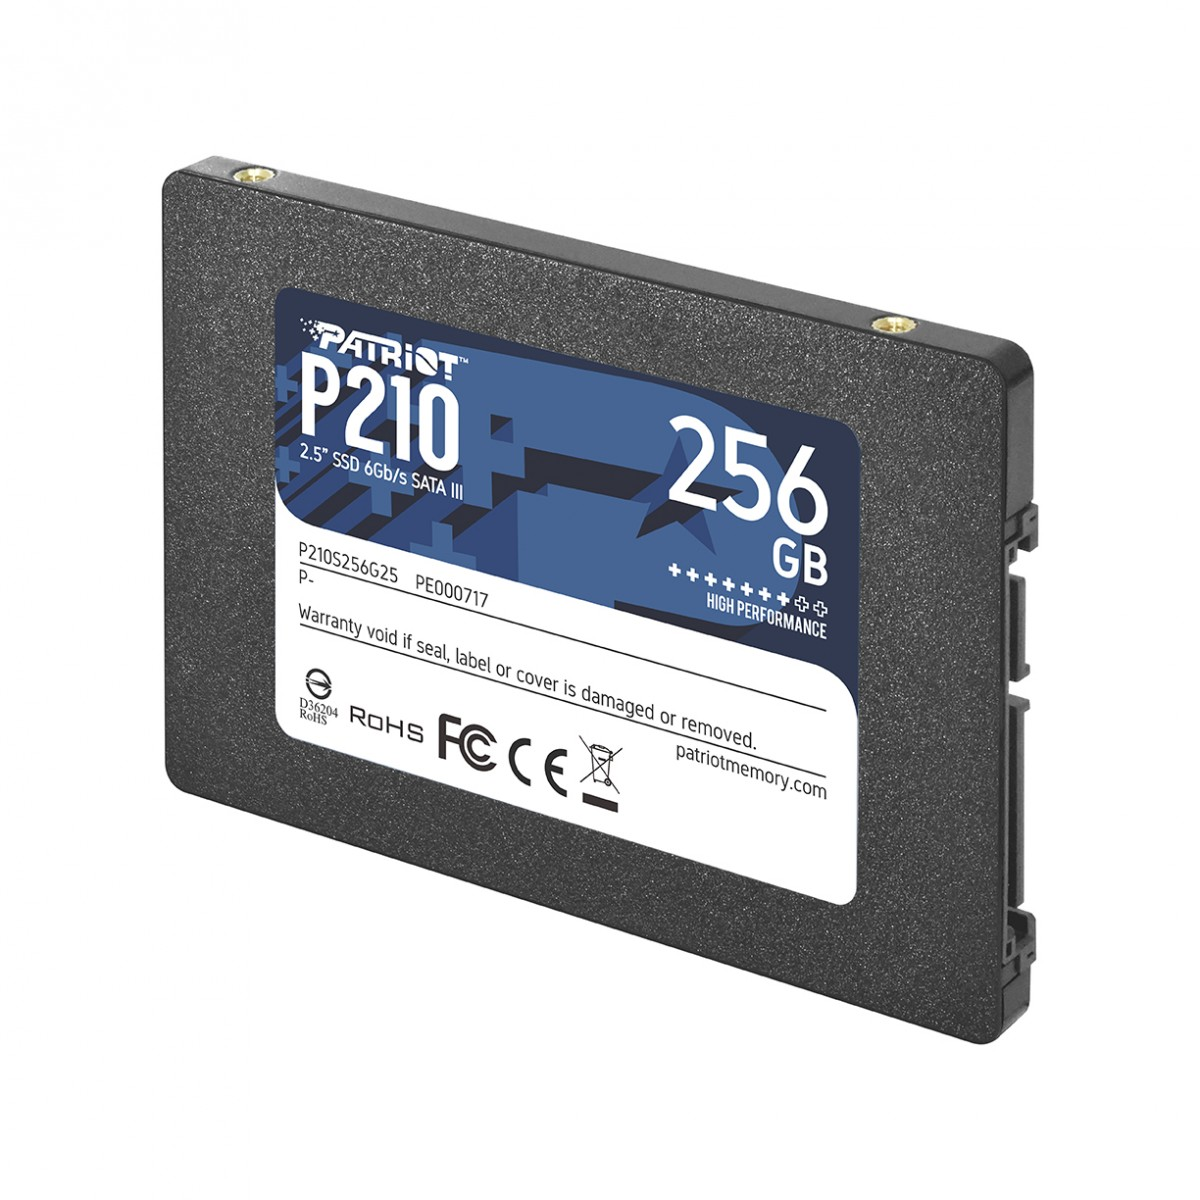 SSD Patriot P210, 256GB, Sata III, Leitura 500MB/s e Gravação 400MB/s, P210S256G25